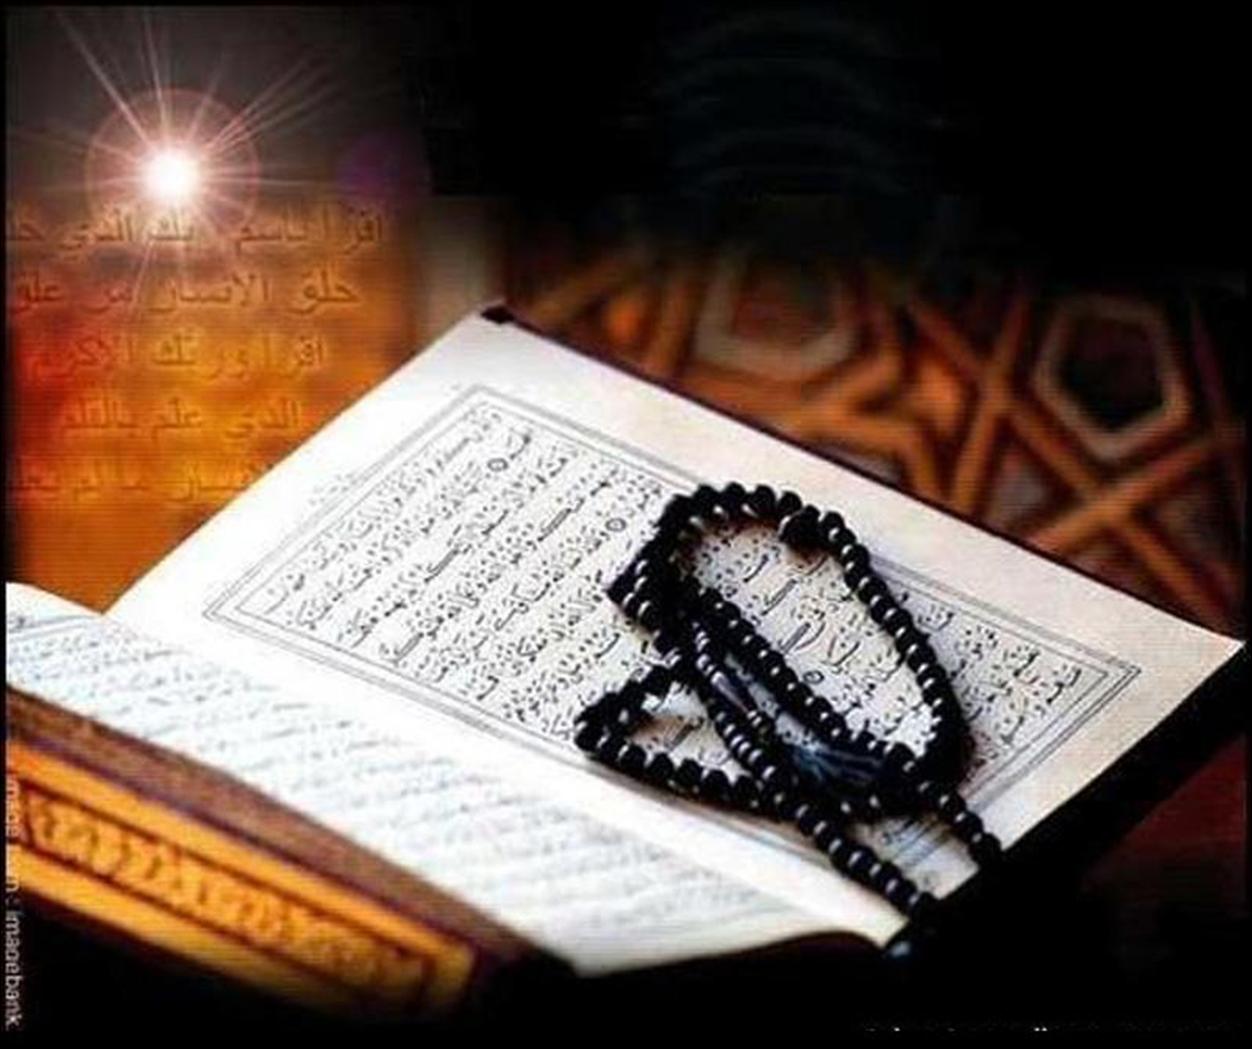 100 Gambar Animasi Al Quran Dan Tasbih Hd Gambar Pixabay